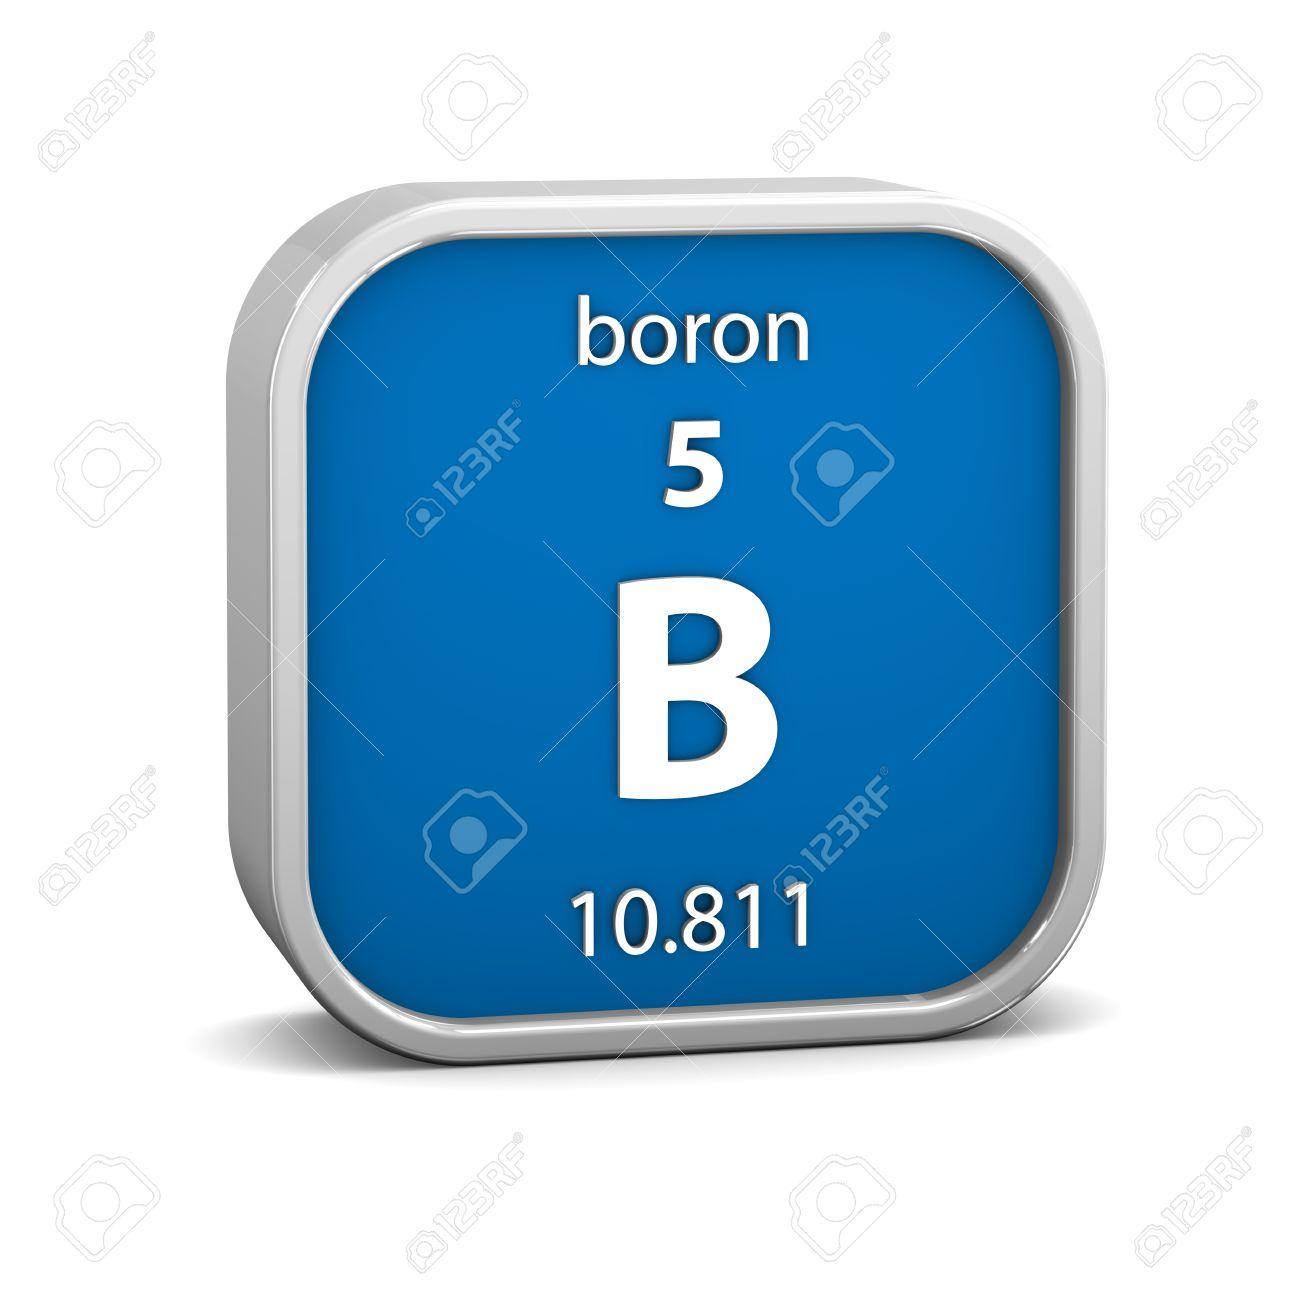 Boron periodic table symbol gamestrikefo Image collections